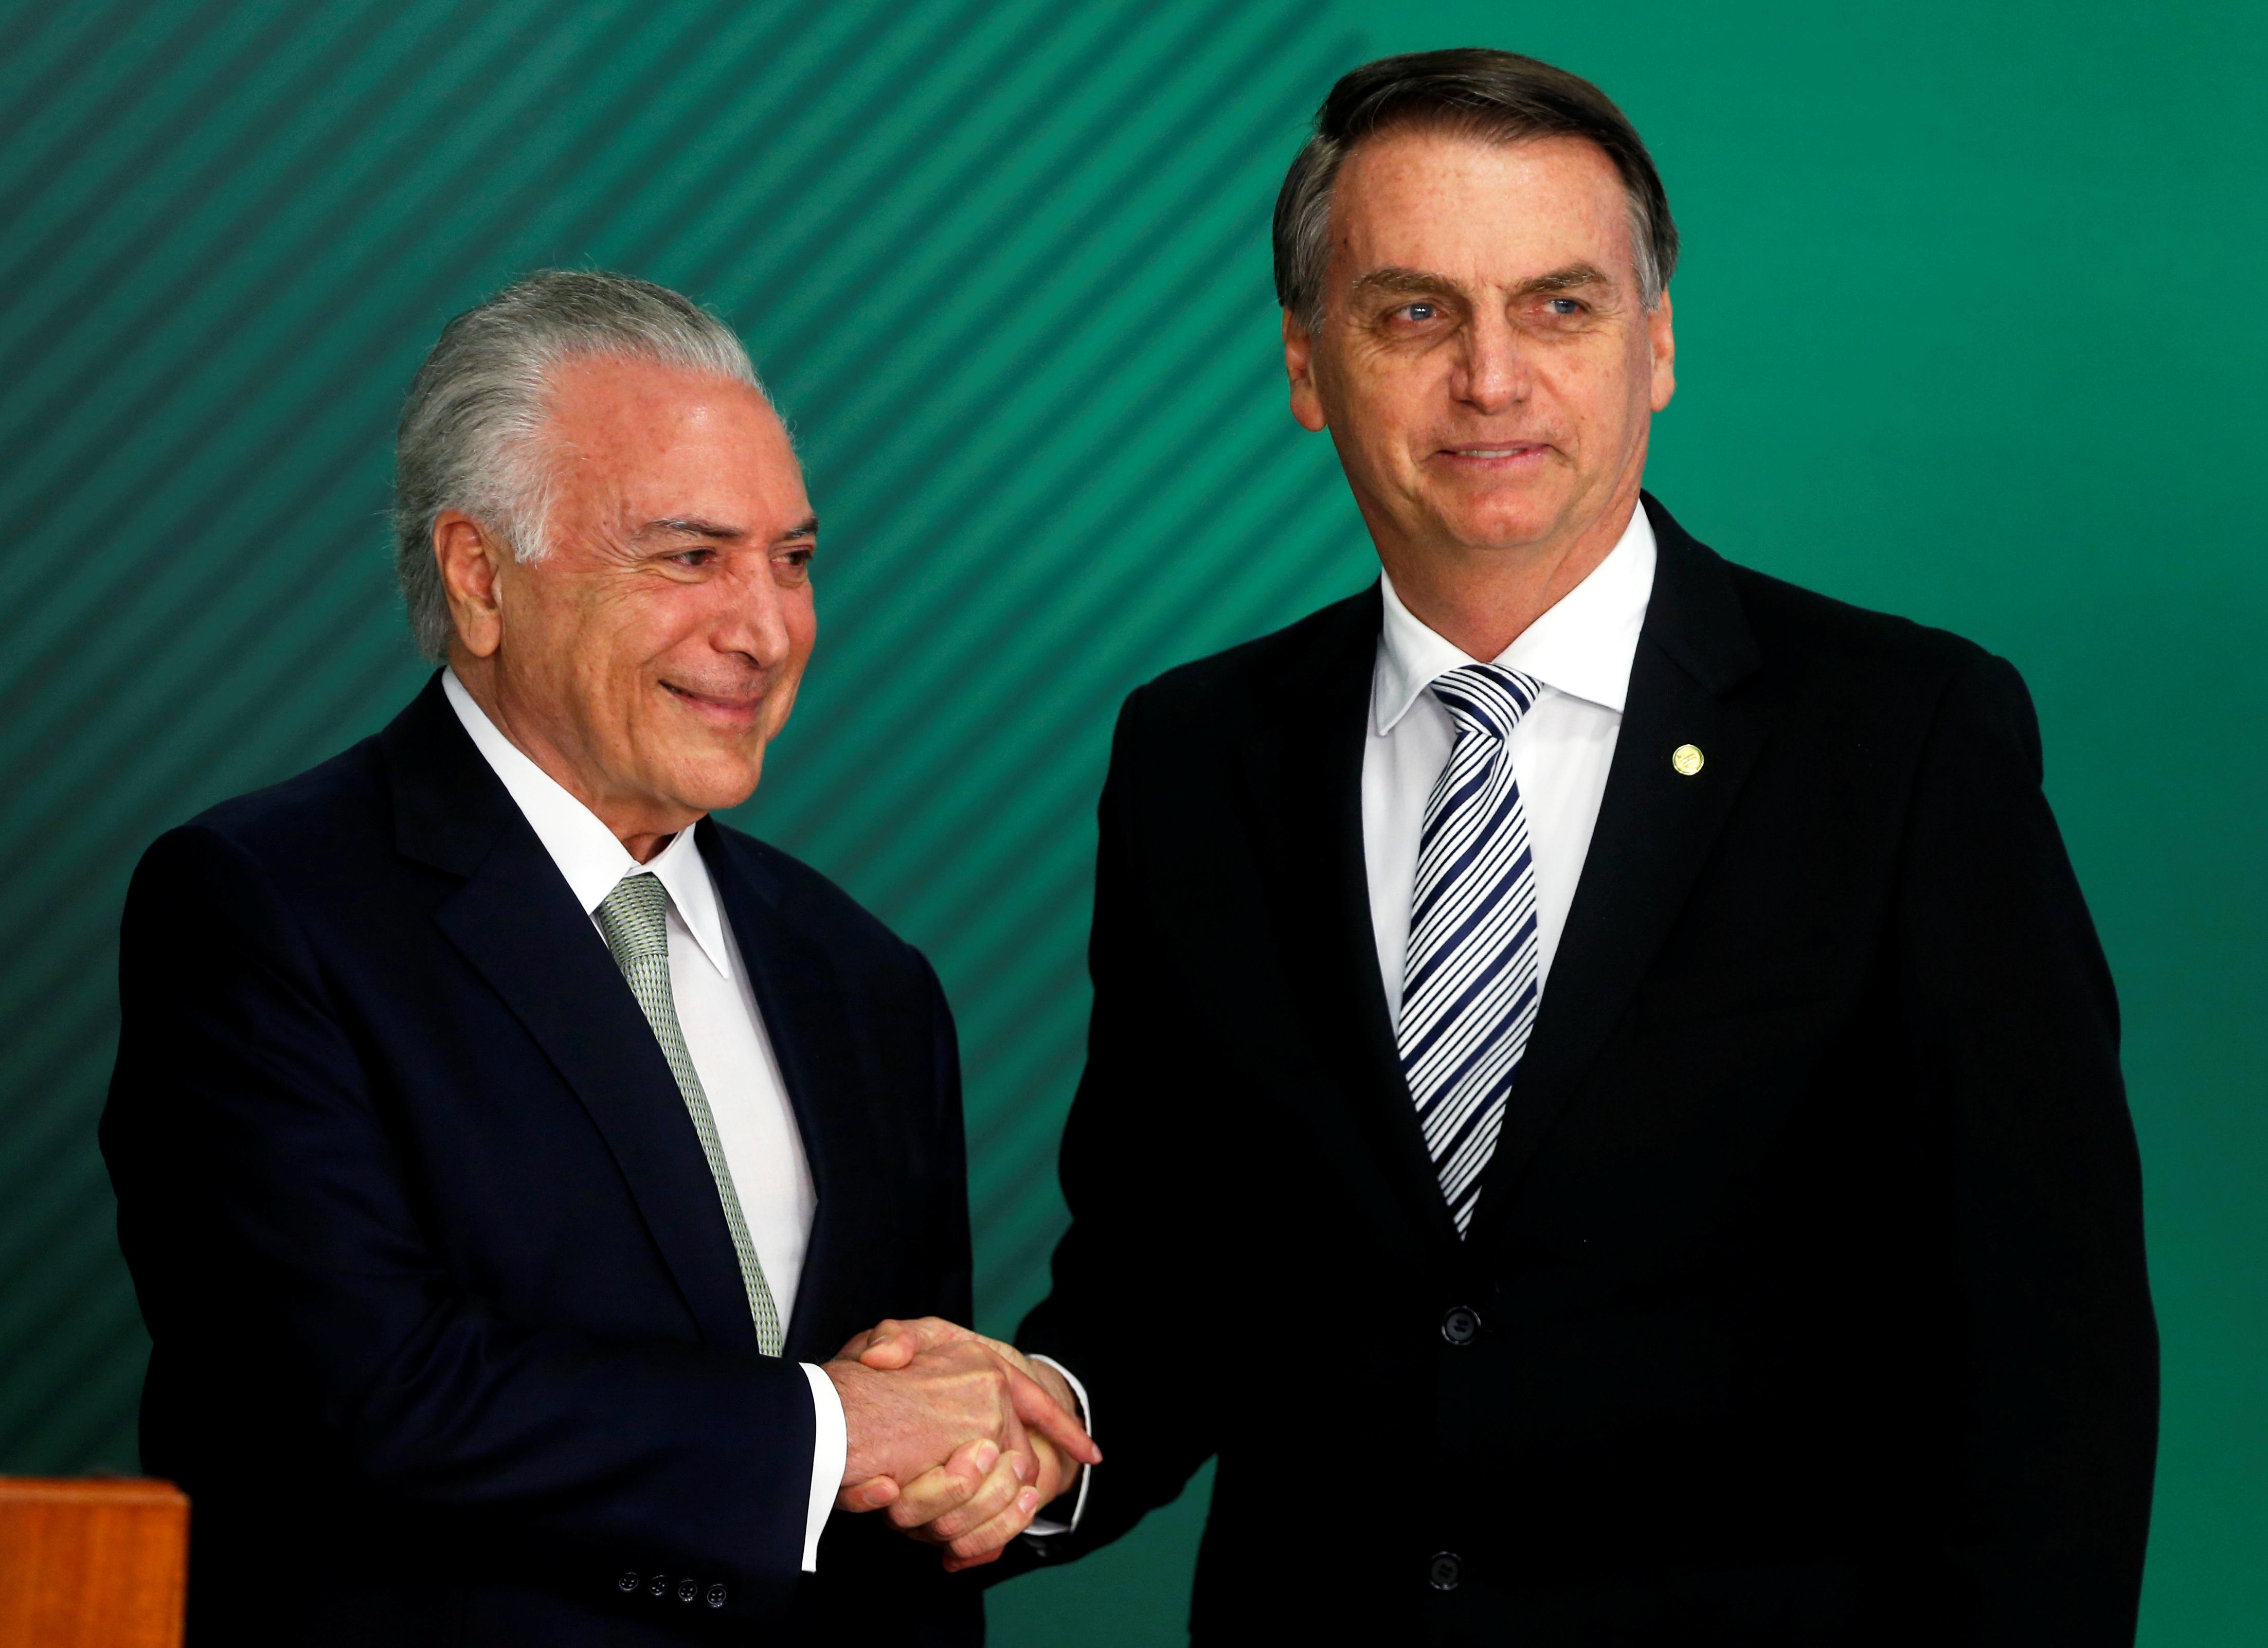 Jair Bolsonaro será operado antes de asumir la presidencia